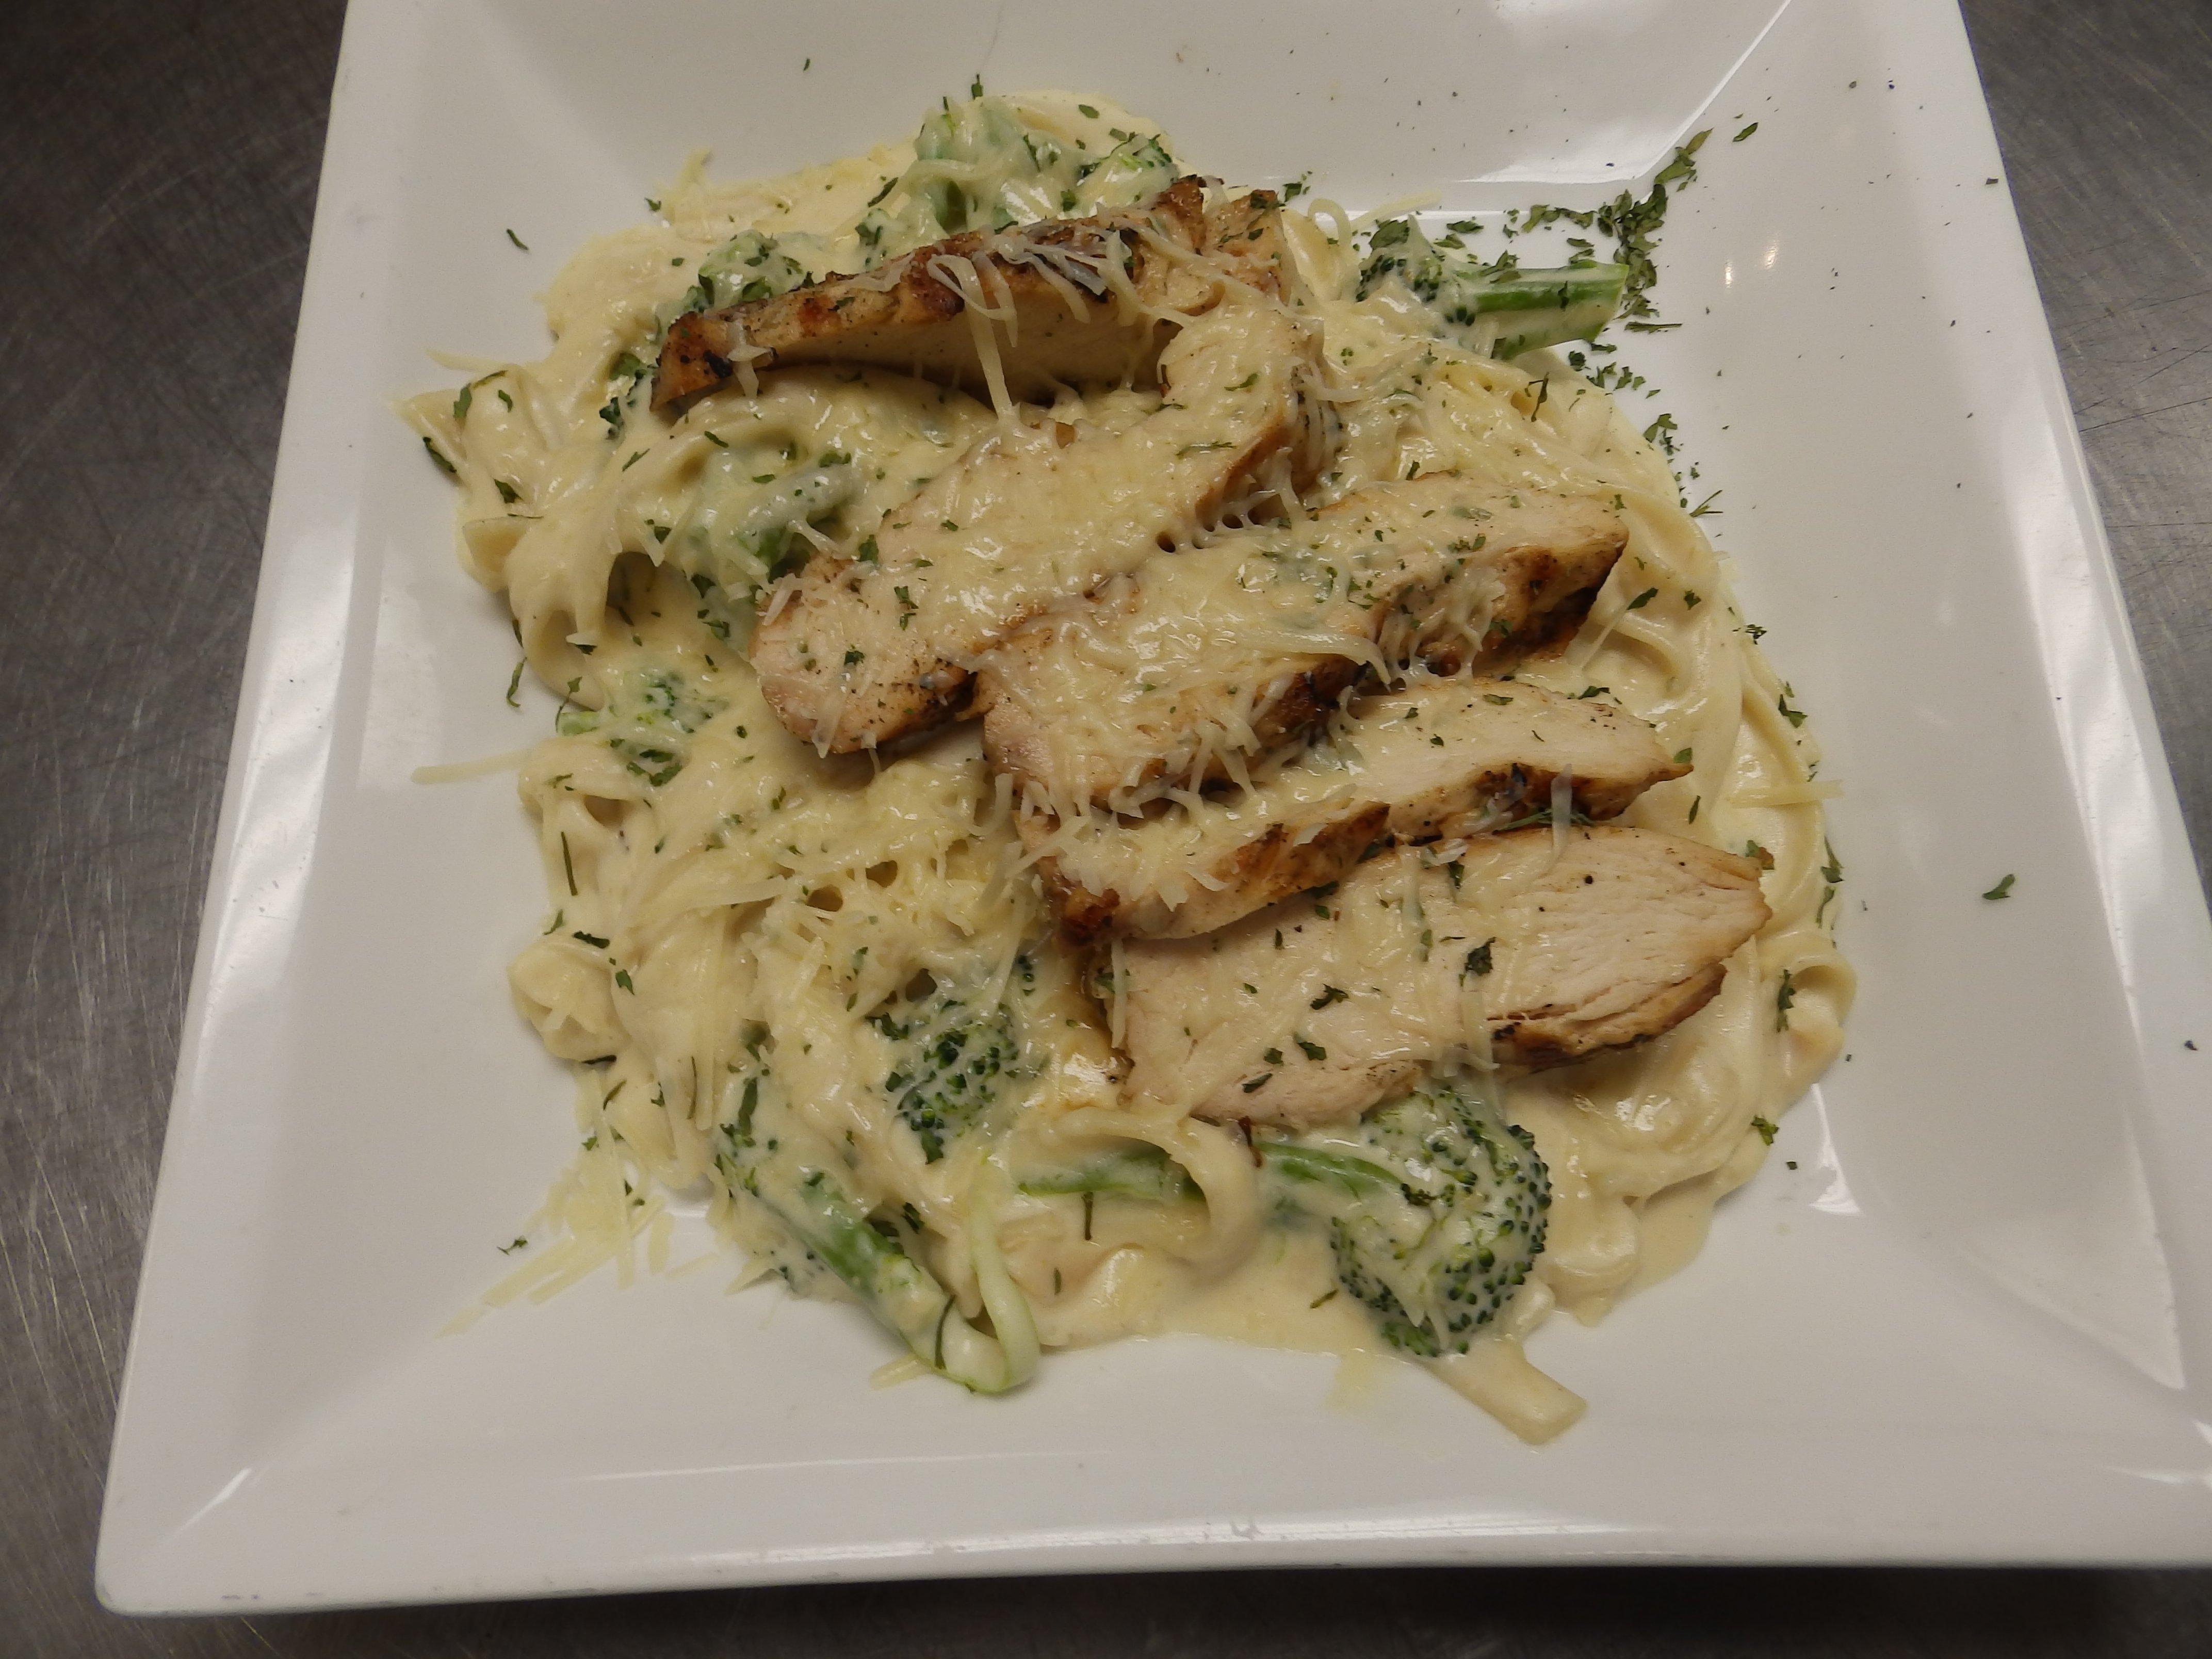 Charlmont Restaurant's chicken broccoli alfredo